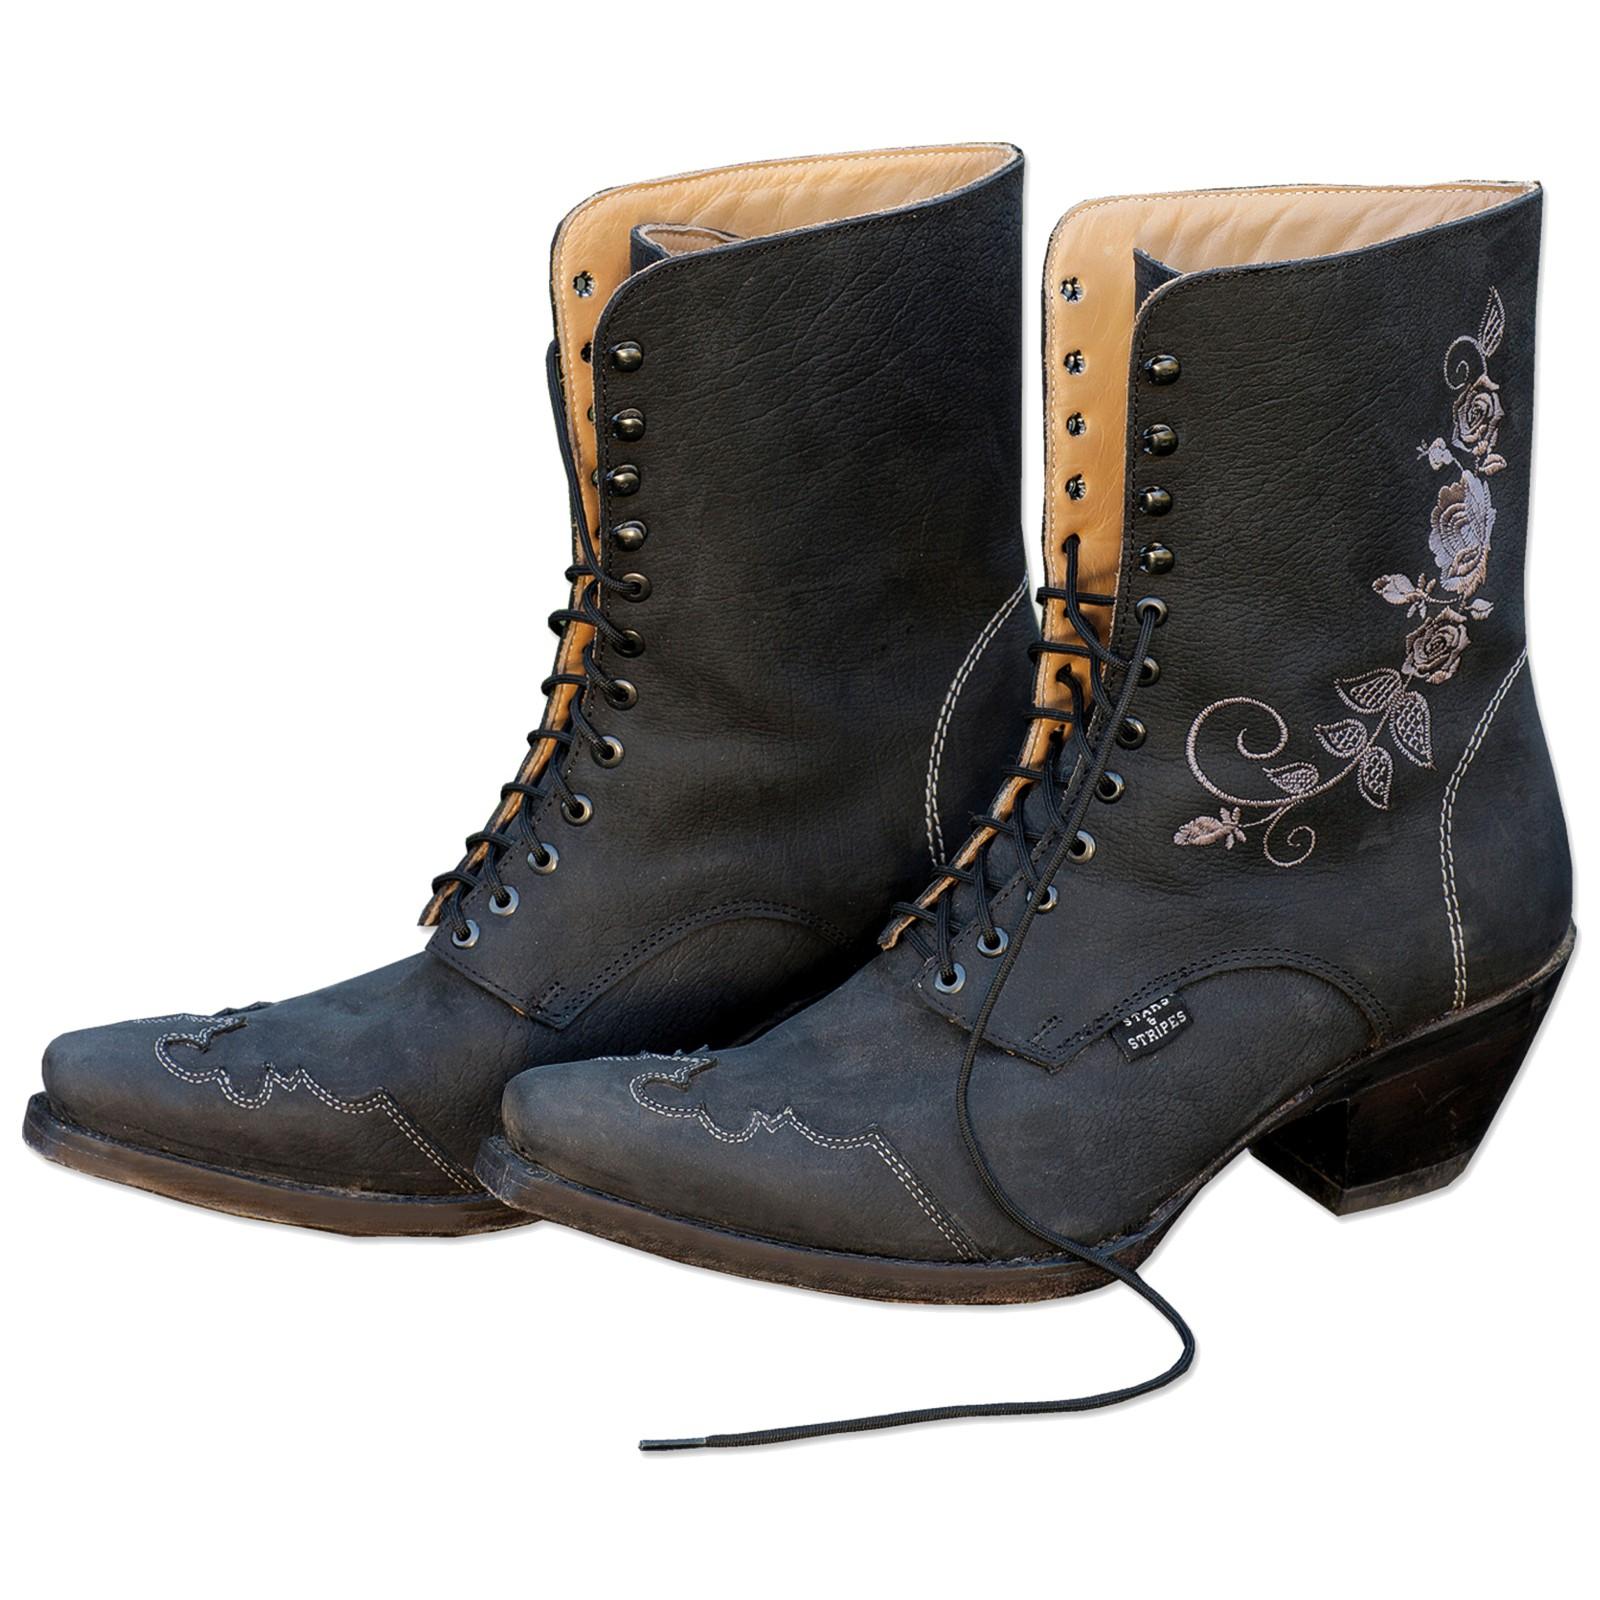 Stripes Starsamp; Western Stiefel Schwarz Damen 41 Boots Gr »rosi« Nw8m0n